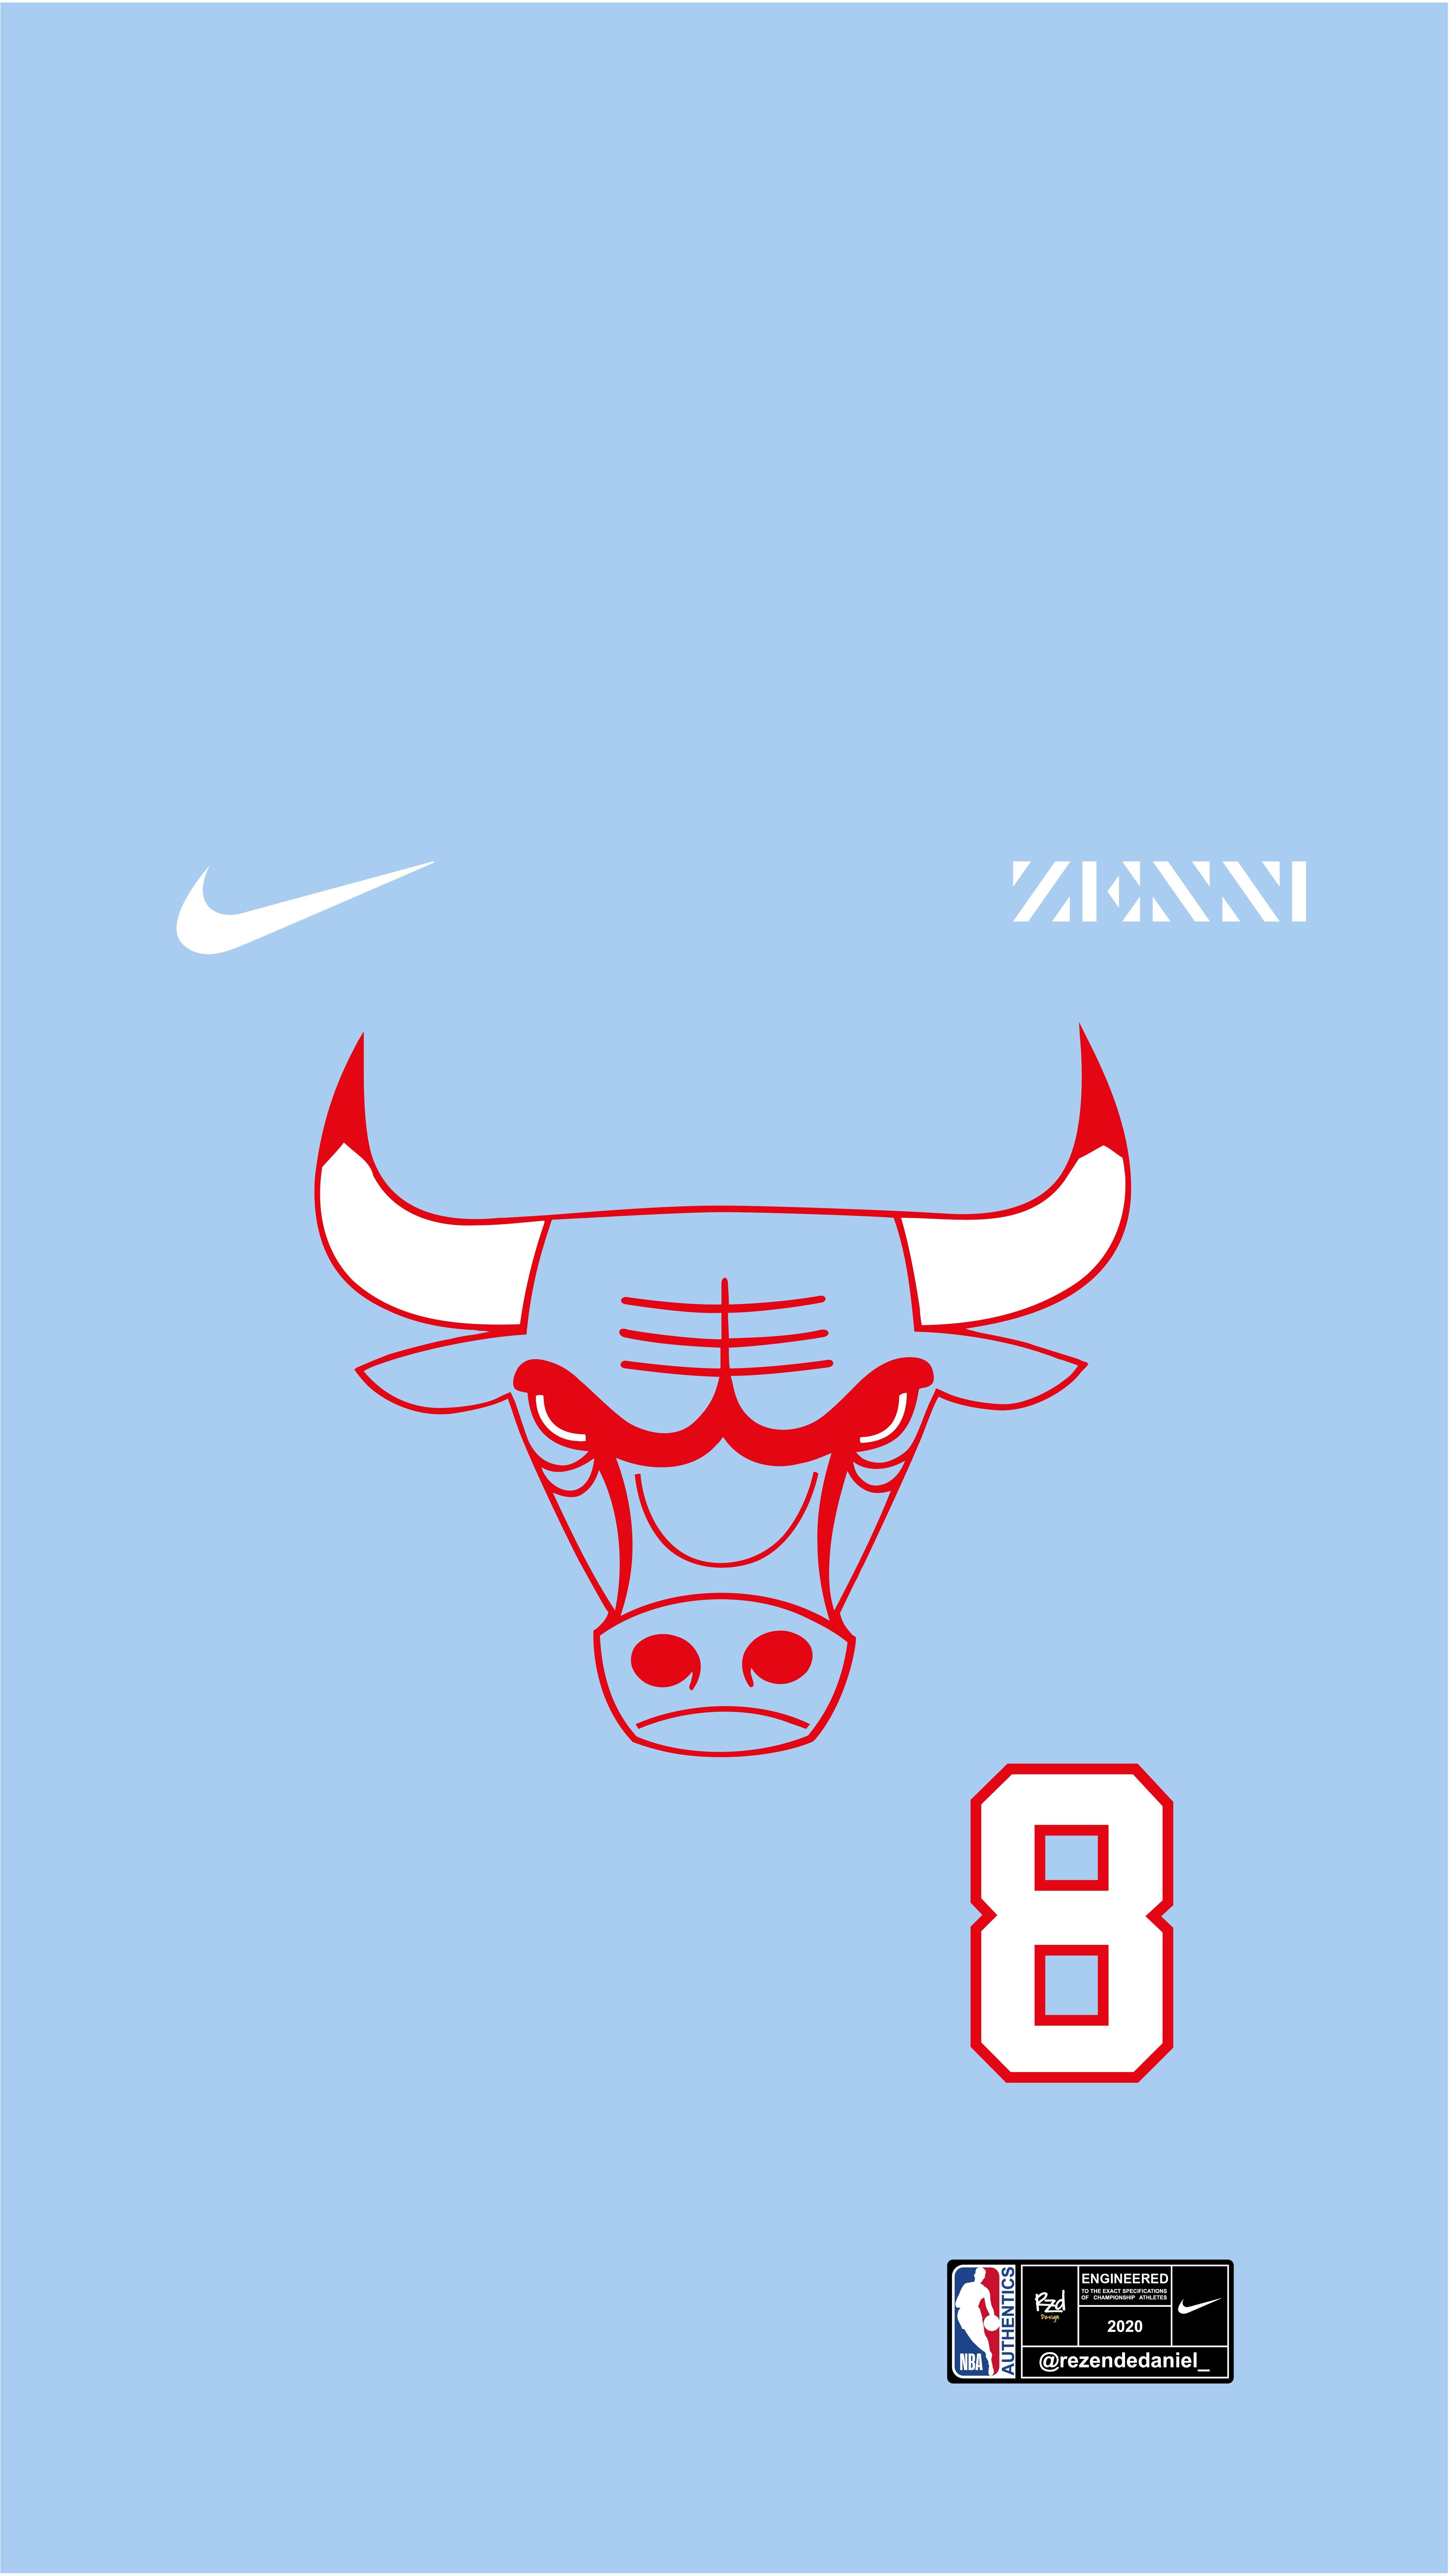 Wallpapers Nba 2019 20 Chi 04 Bulls Wallpaper Chicago Bulls Wallpaper Jordan Logo Wallpaper